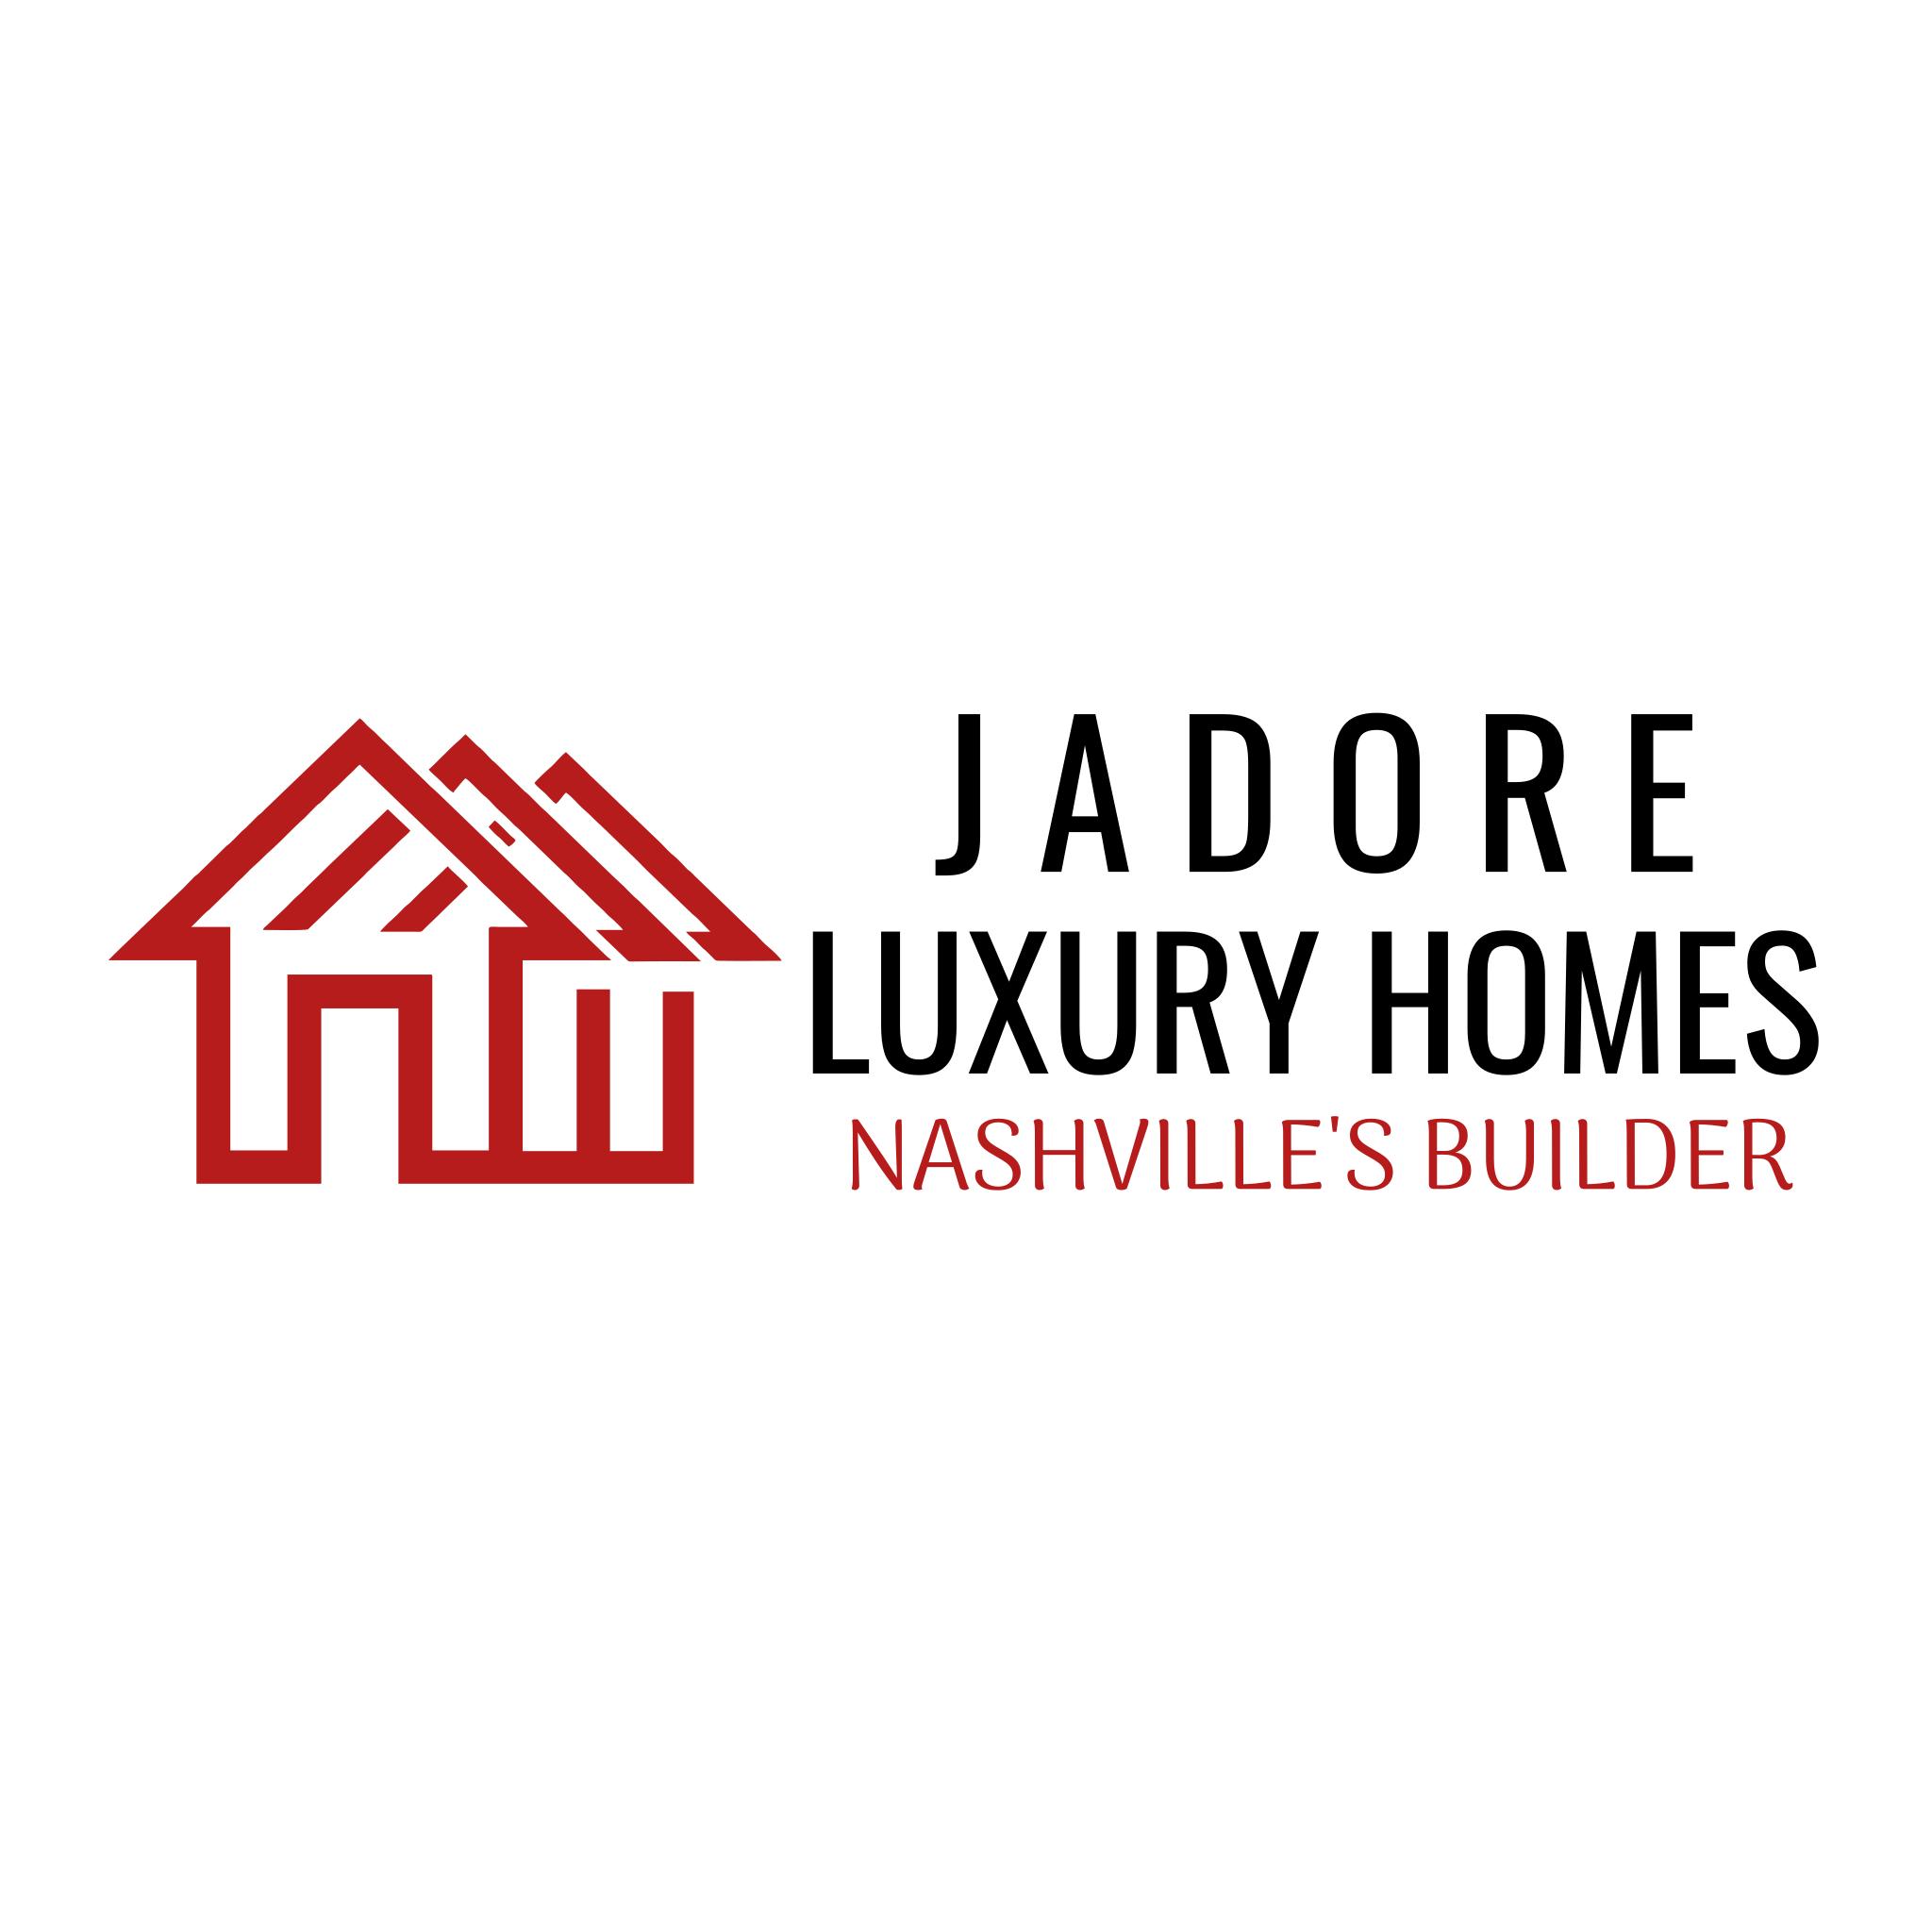 Jadore Luxury Homes